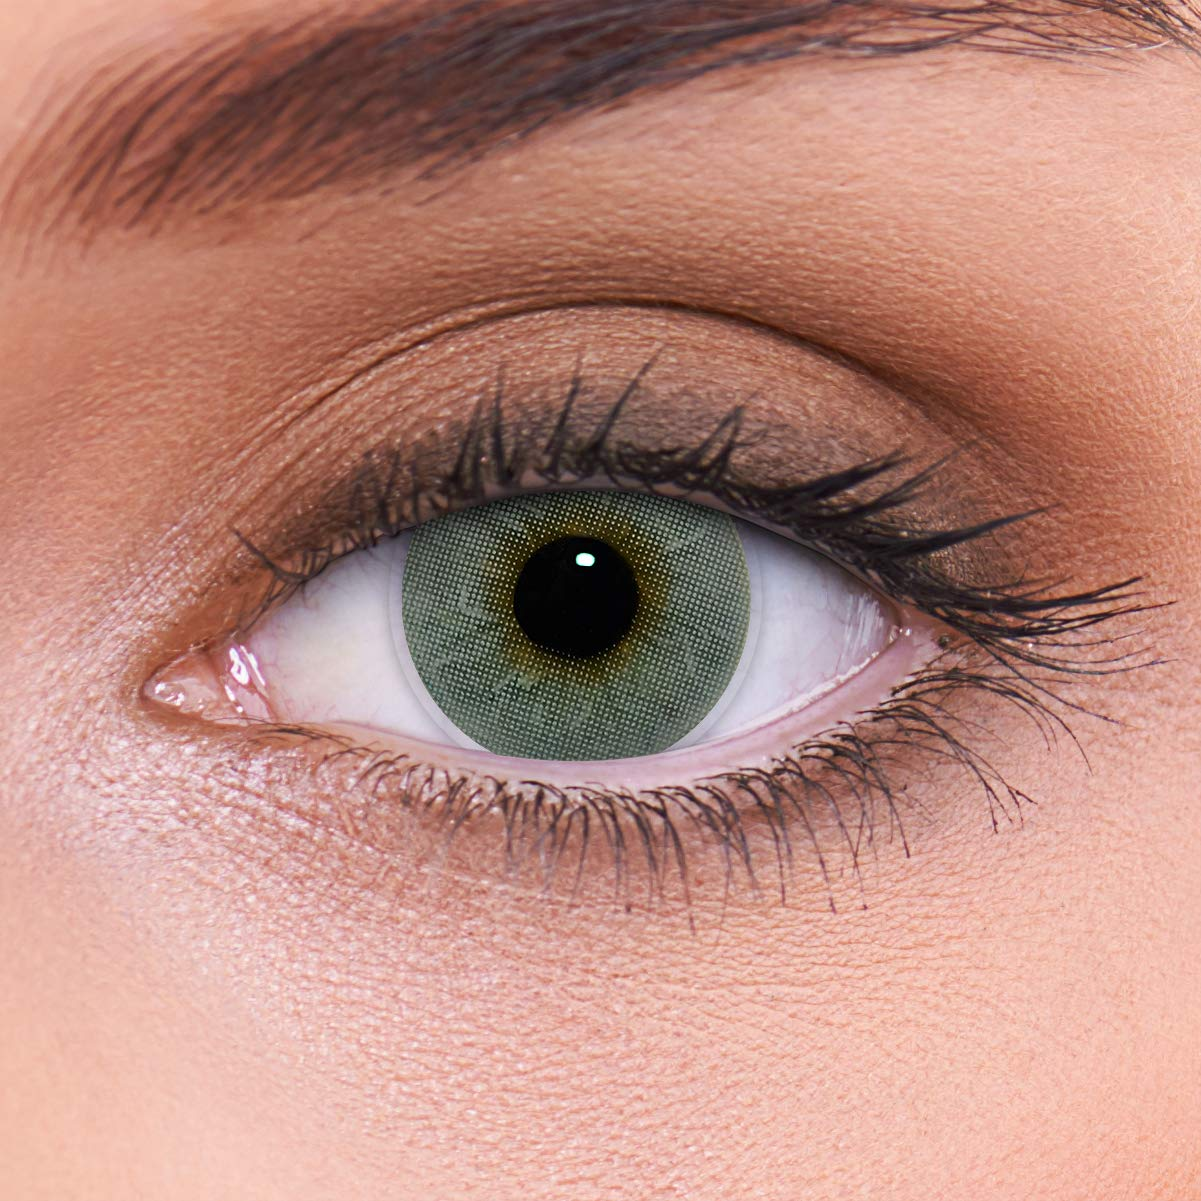 5f59a39e28e77 Altas lentes de contacto grises naturales de color